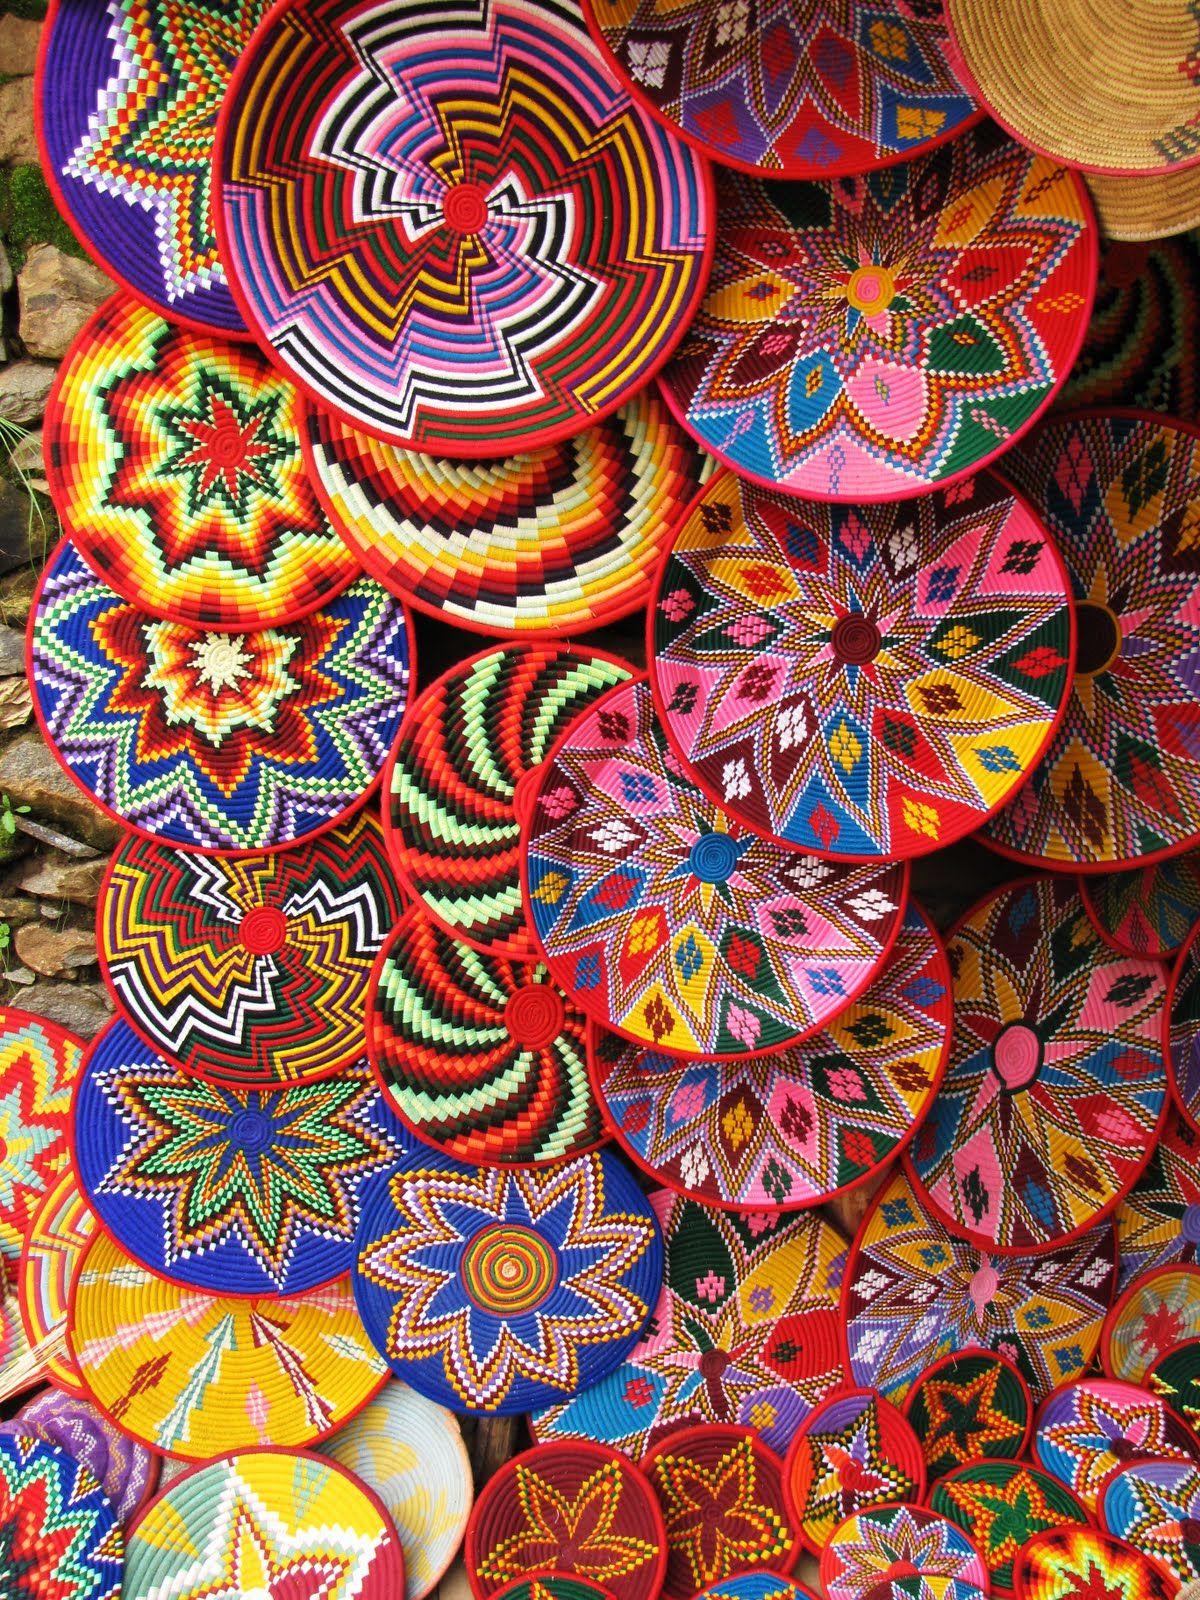 ethiopian art the artist explores various geometric patterns ethiopian art the artist explores various geometric patterns which reminds me of the metaphysical flower of life